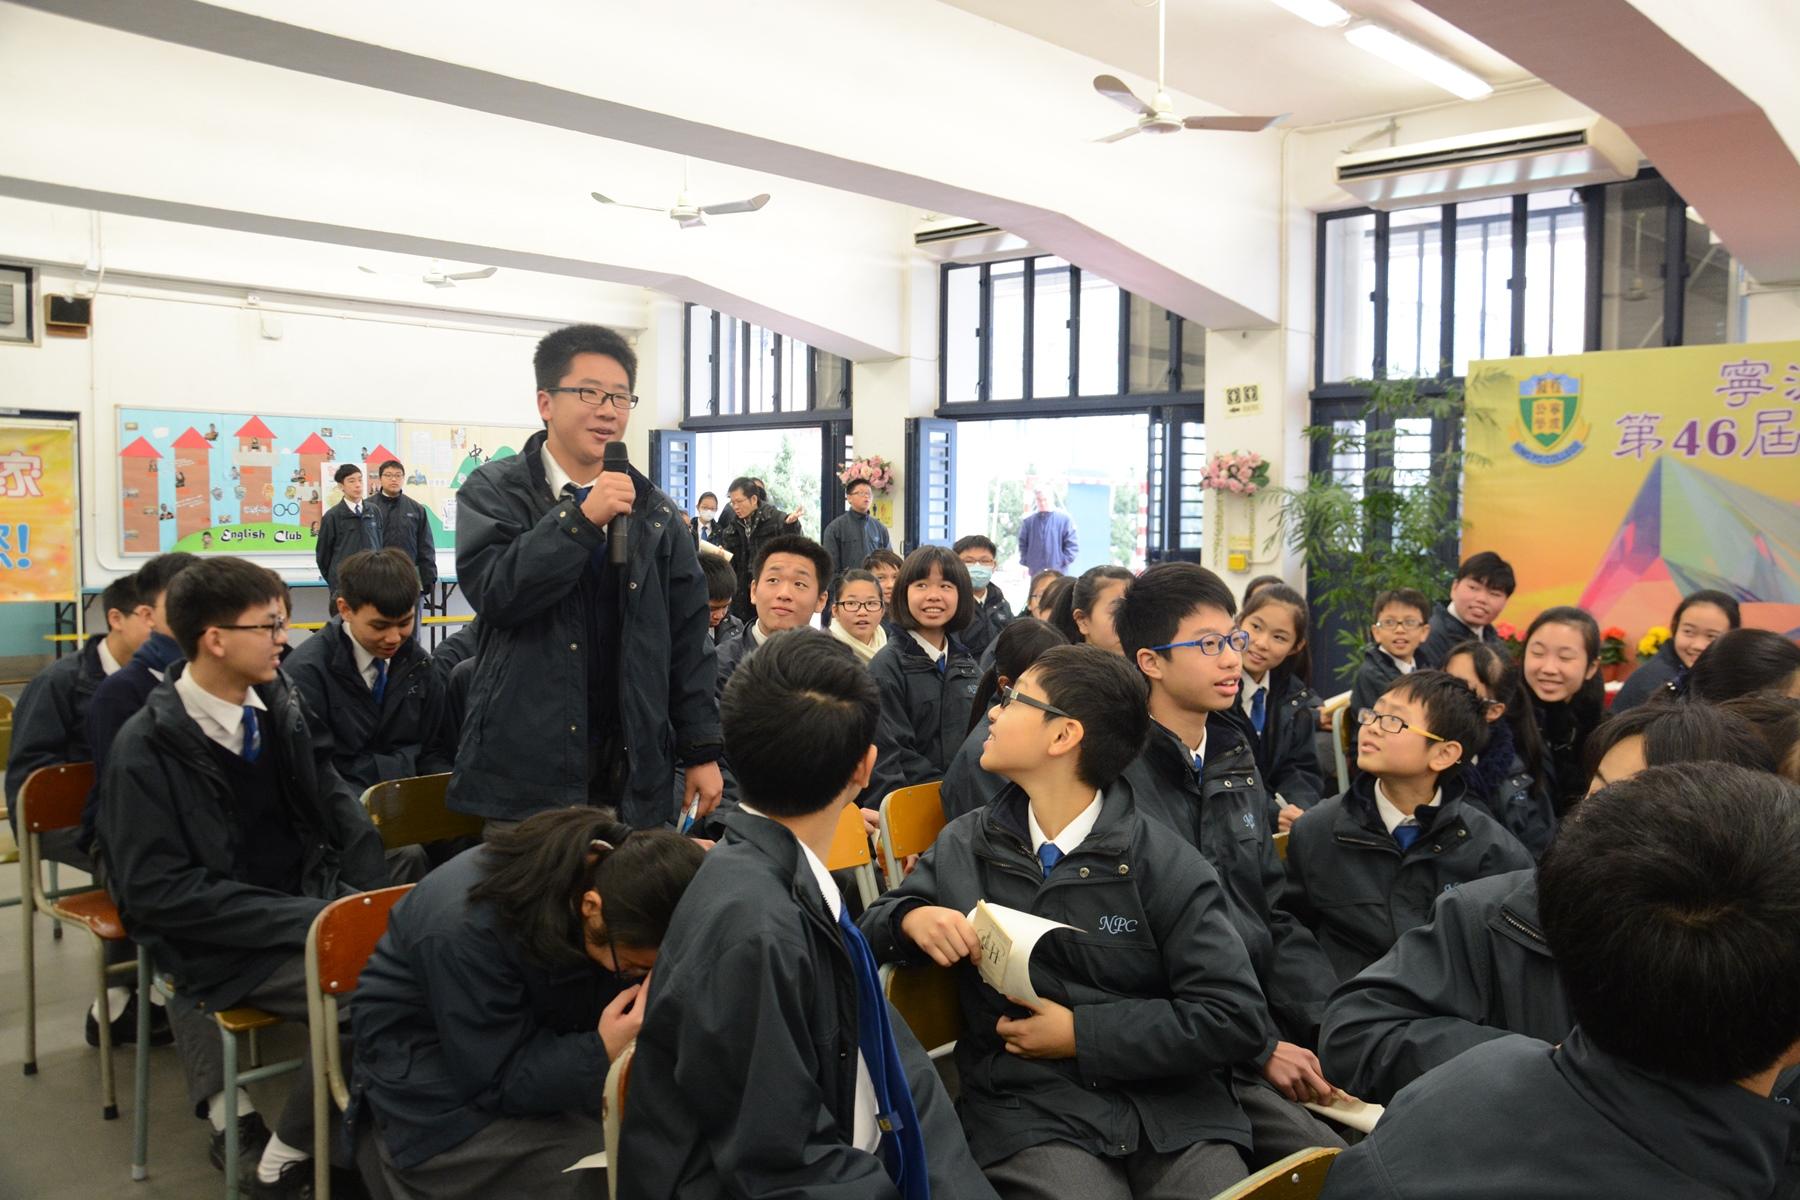 http://npc.edu.hk/sites/default/files/dsc_9658.jpg